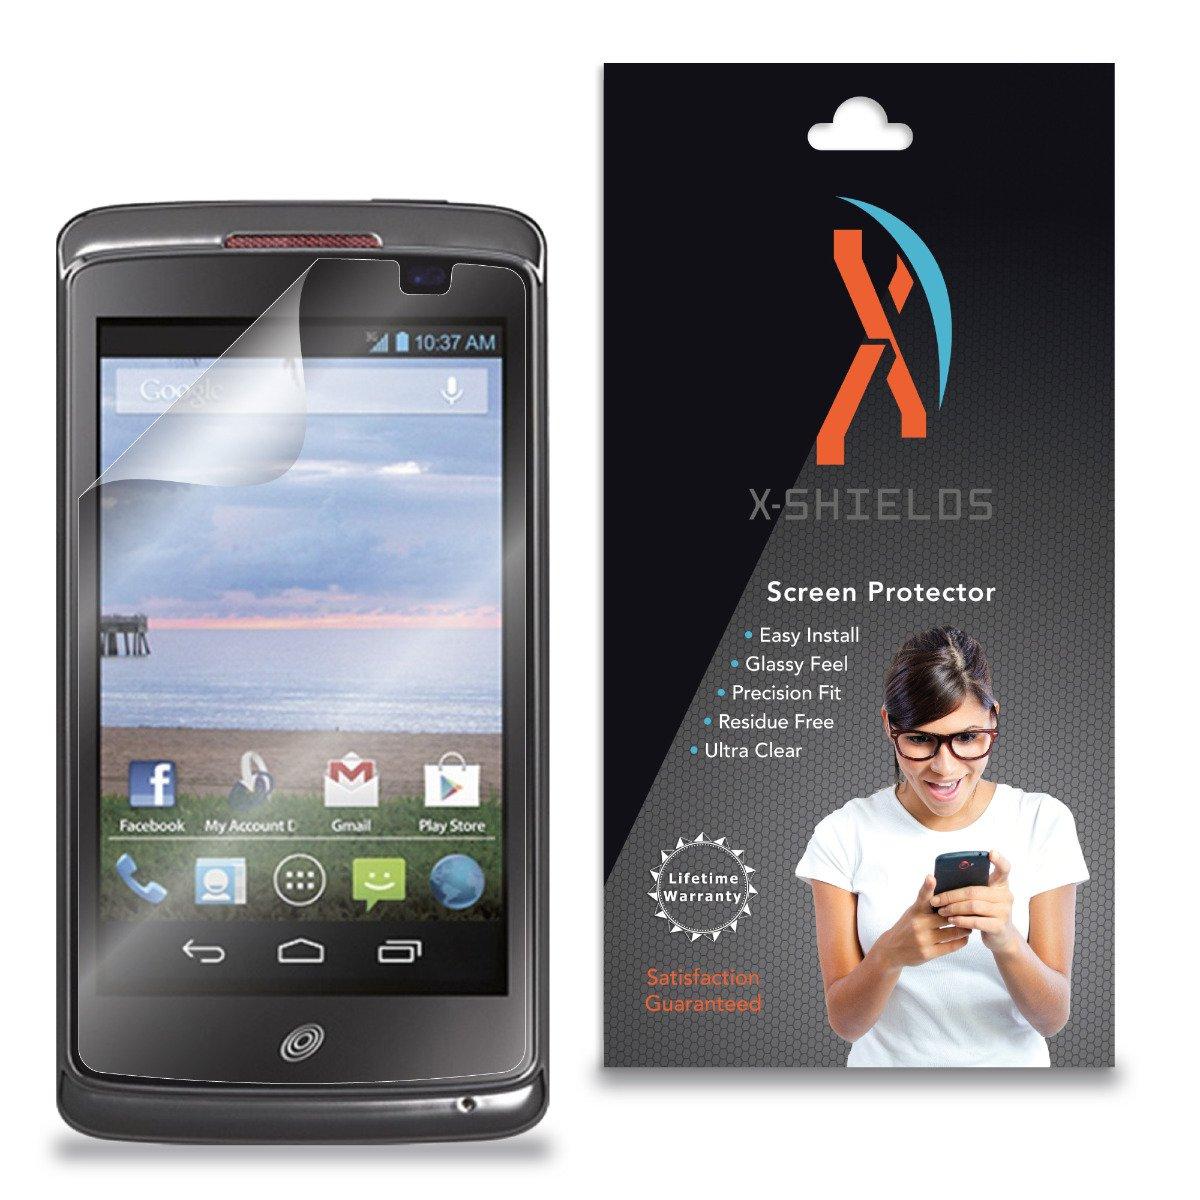 unimax u673c. amazon.com: xshields© (3-pack) screen protectors for unimax tracfone maxpatriot u671c (ultra clear): cell phones \u0026 accessories u673c s